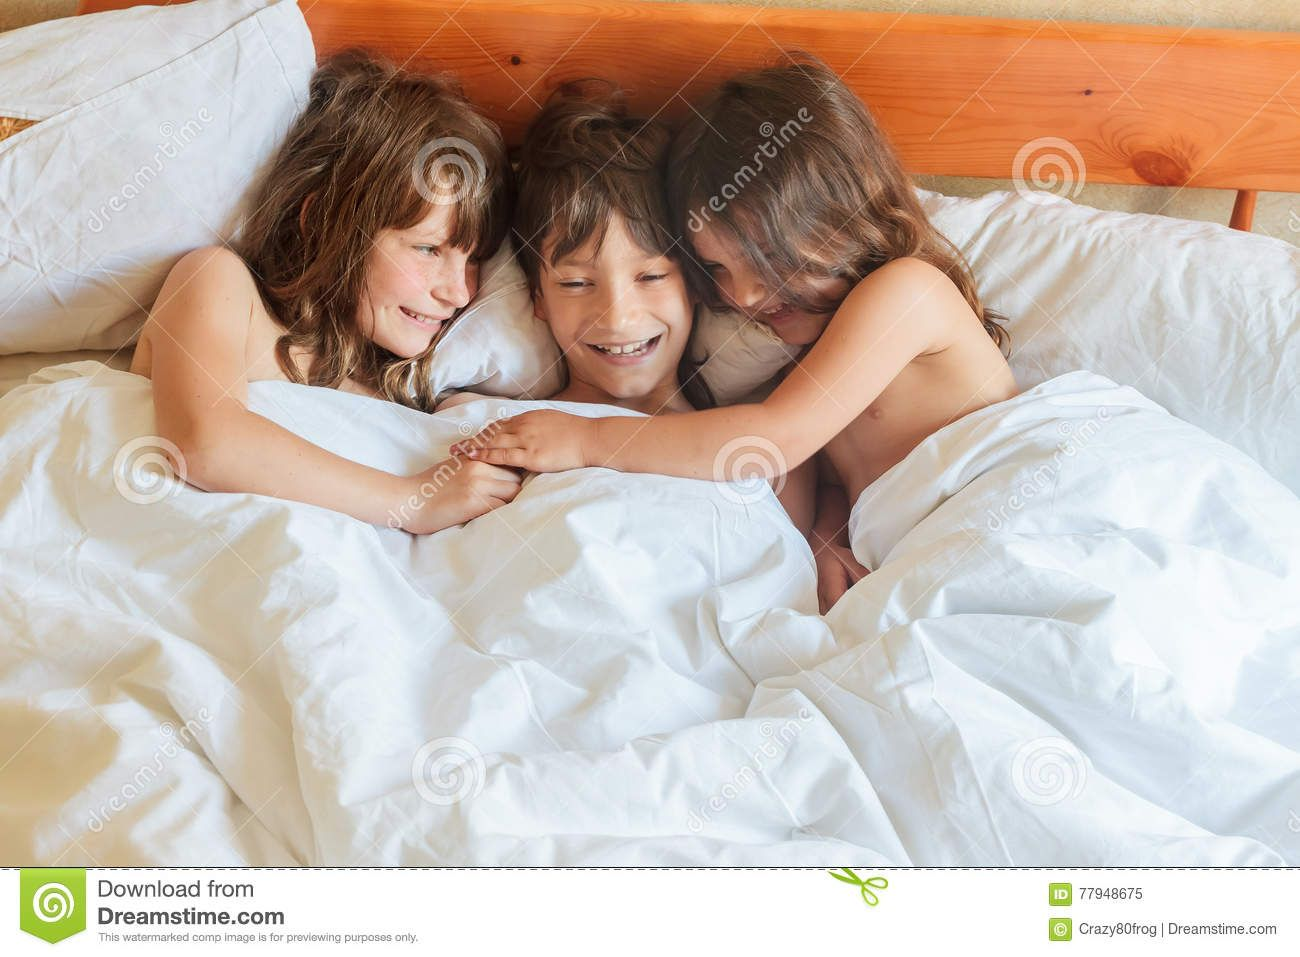 Pin By Joshua On Joshua Girl Sleeping Sleeping In Bed Kids Boys